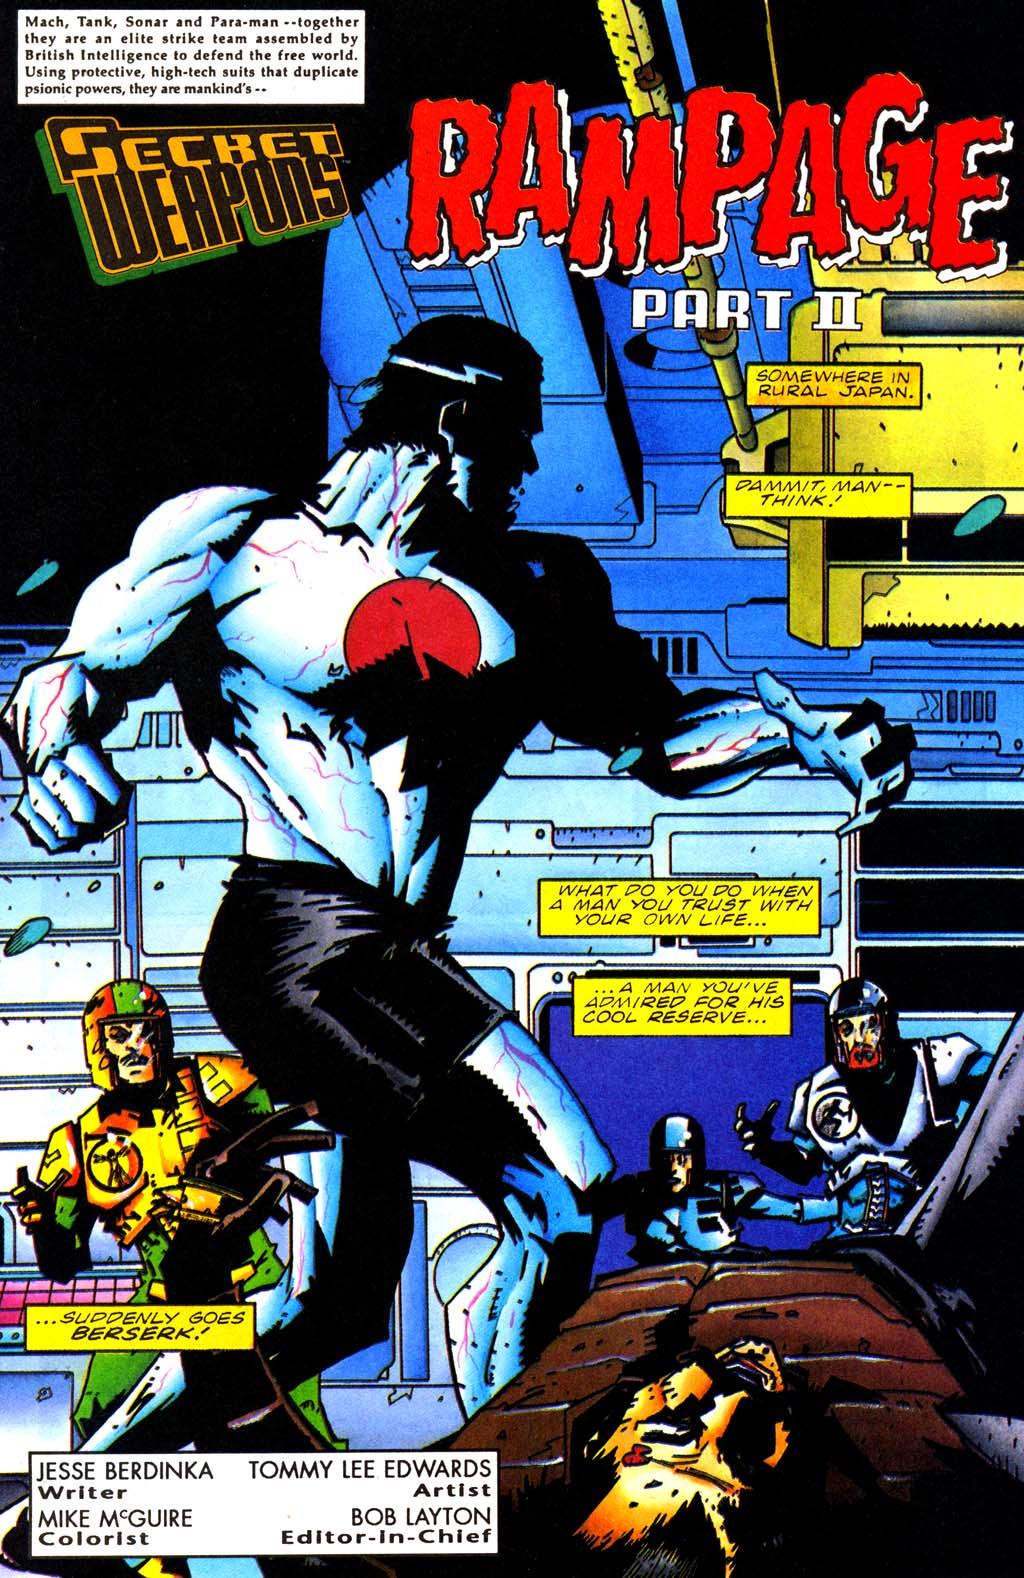 Read online Secret Weapons comic -  Issue #20 - 2